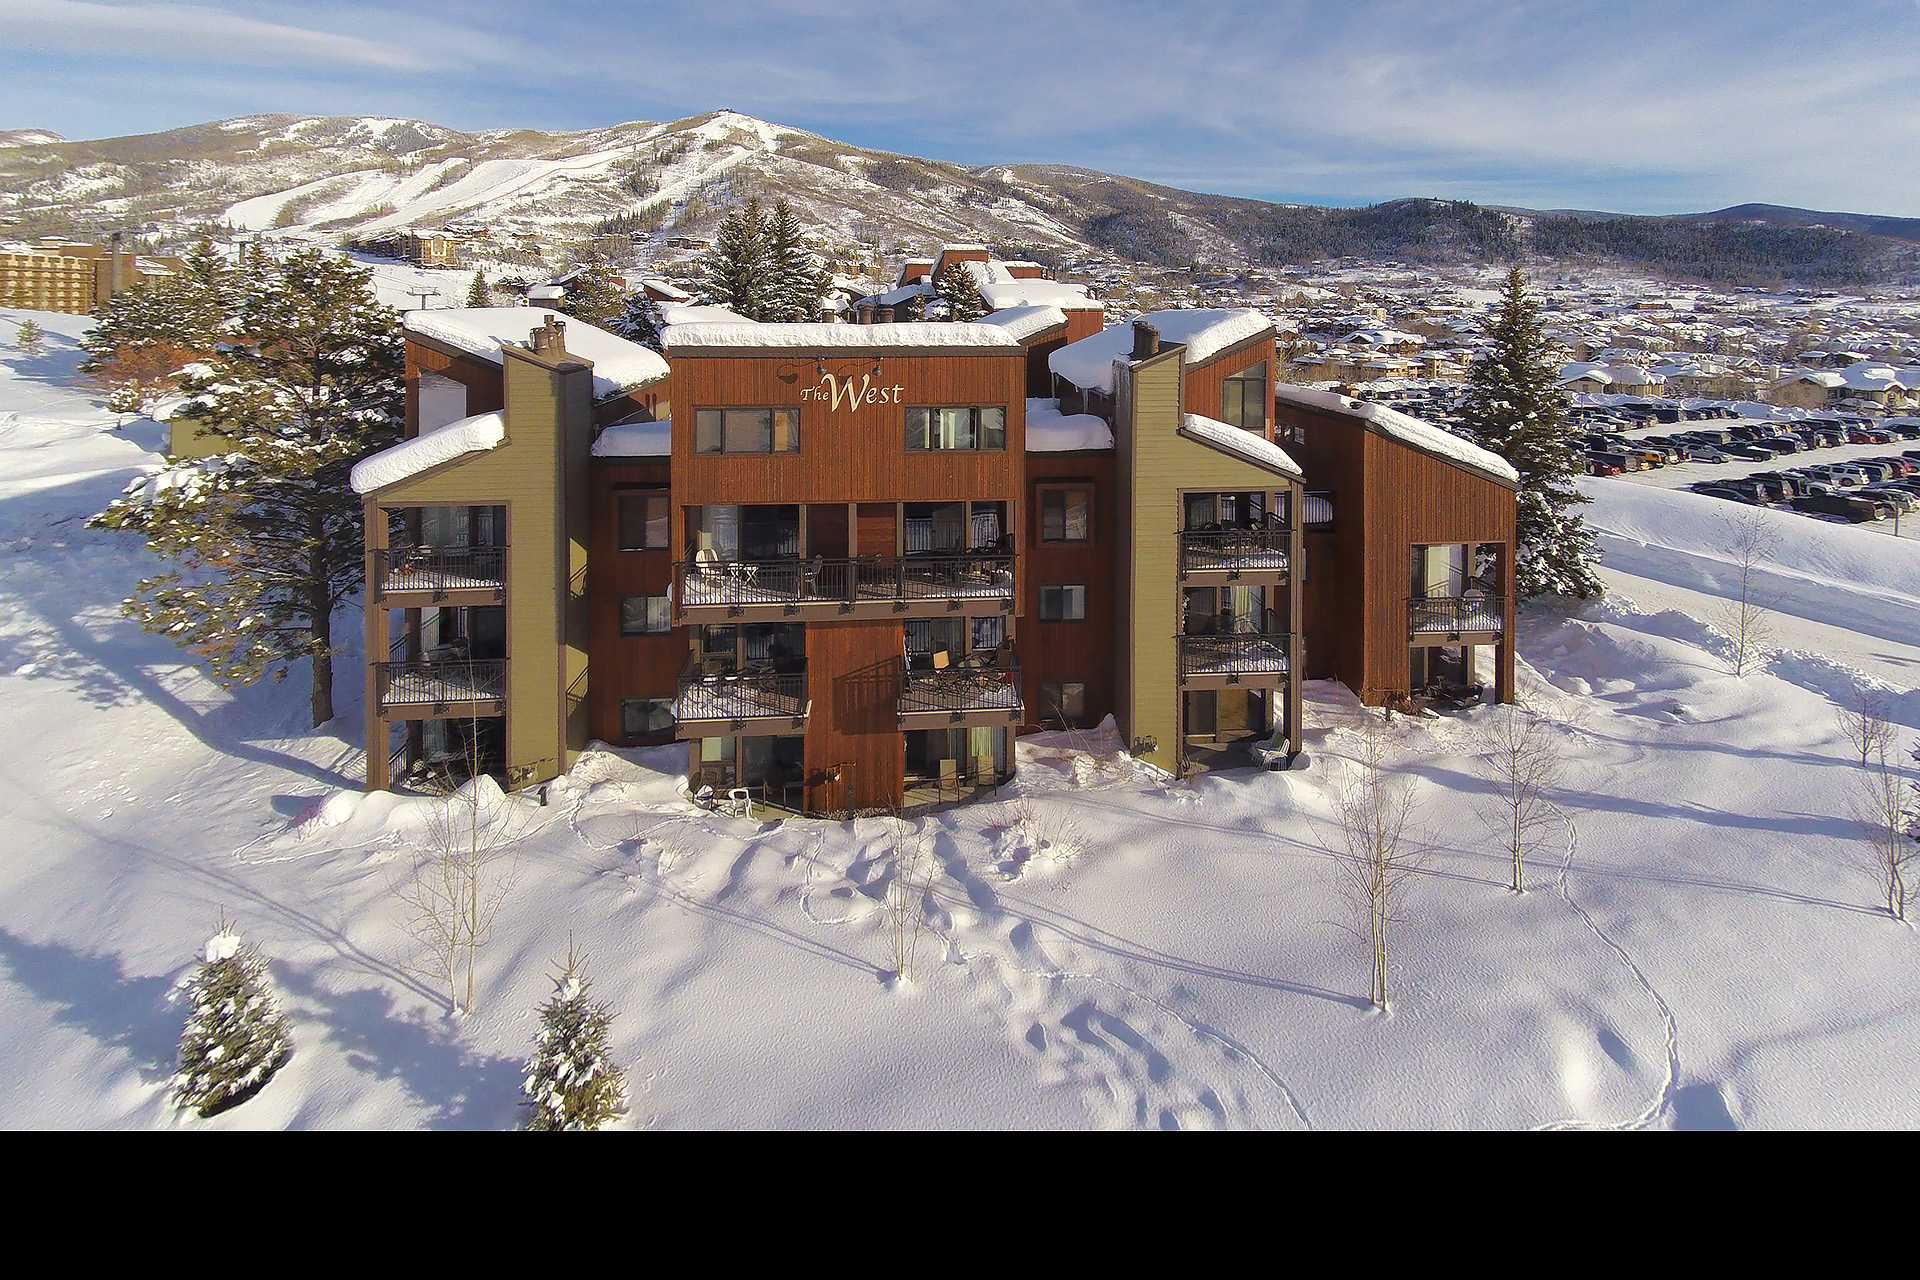 W3323: The West Condominiums